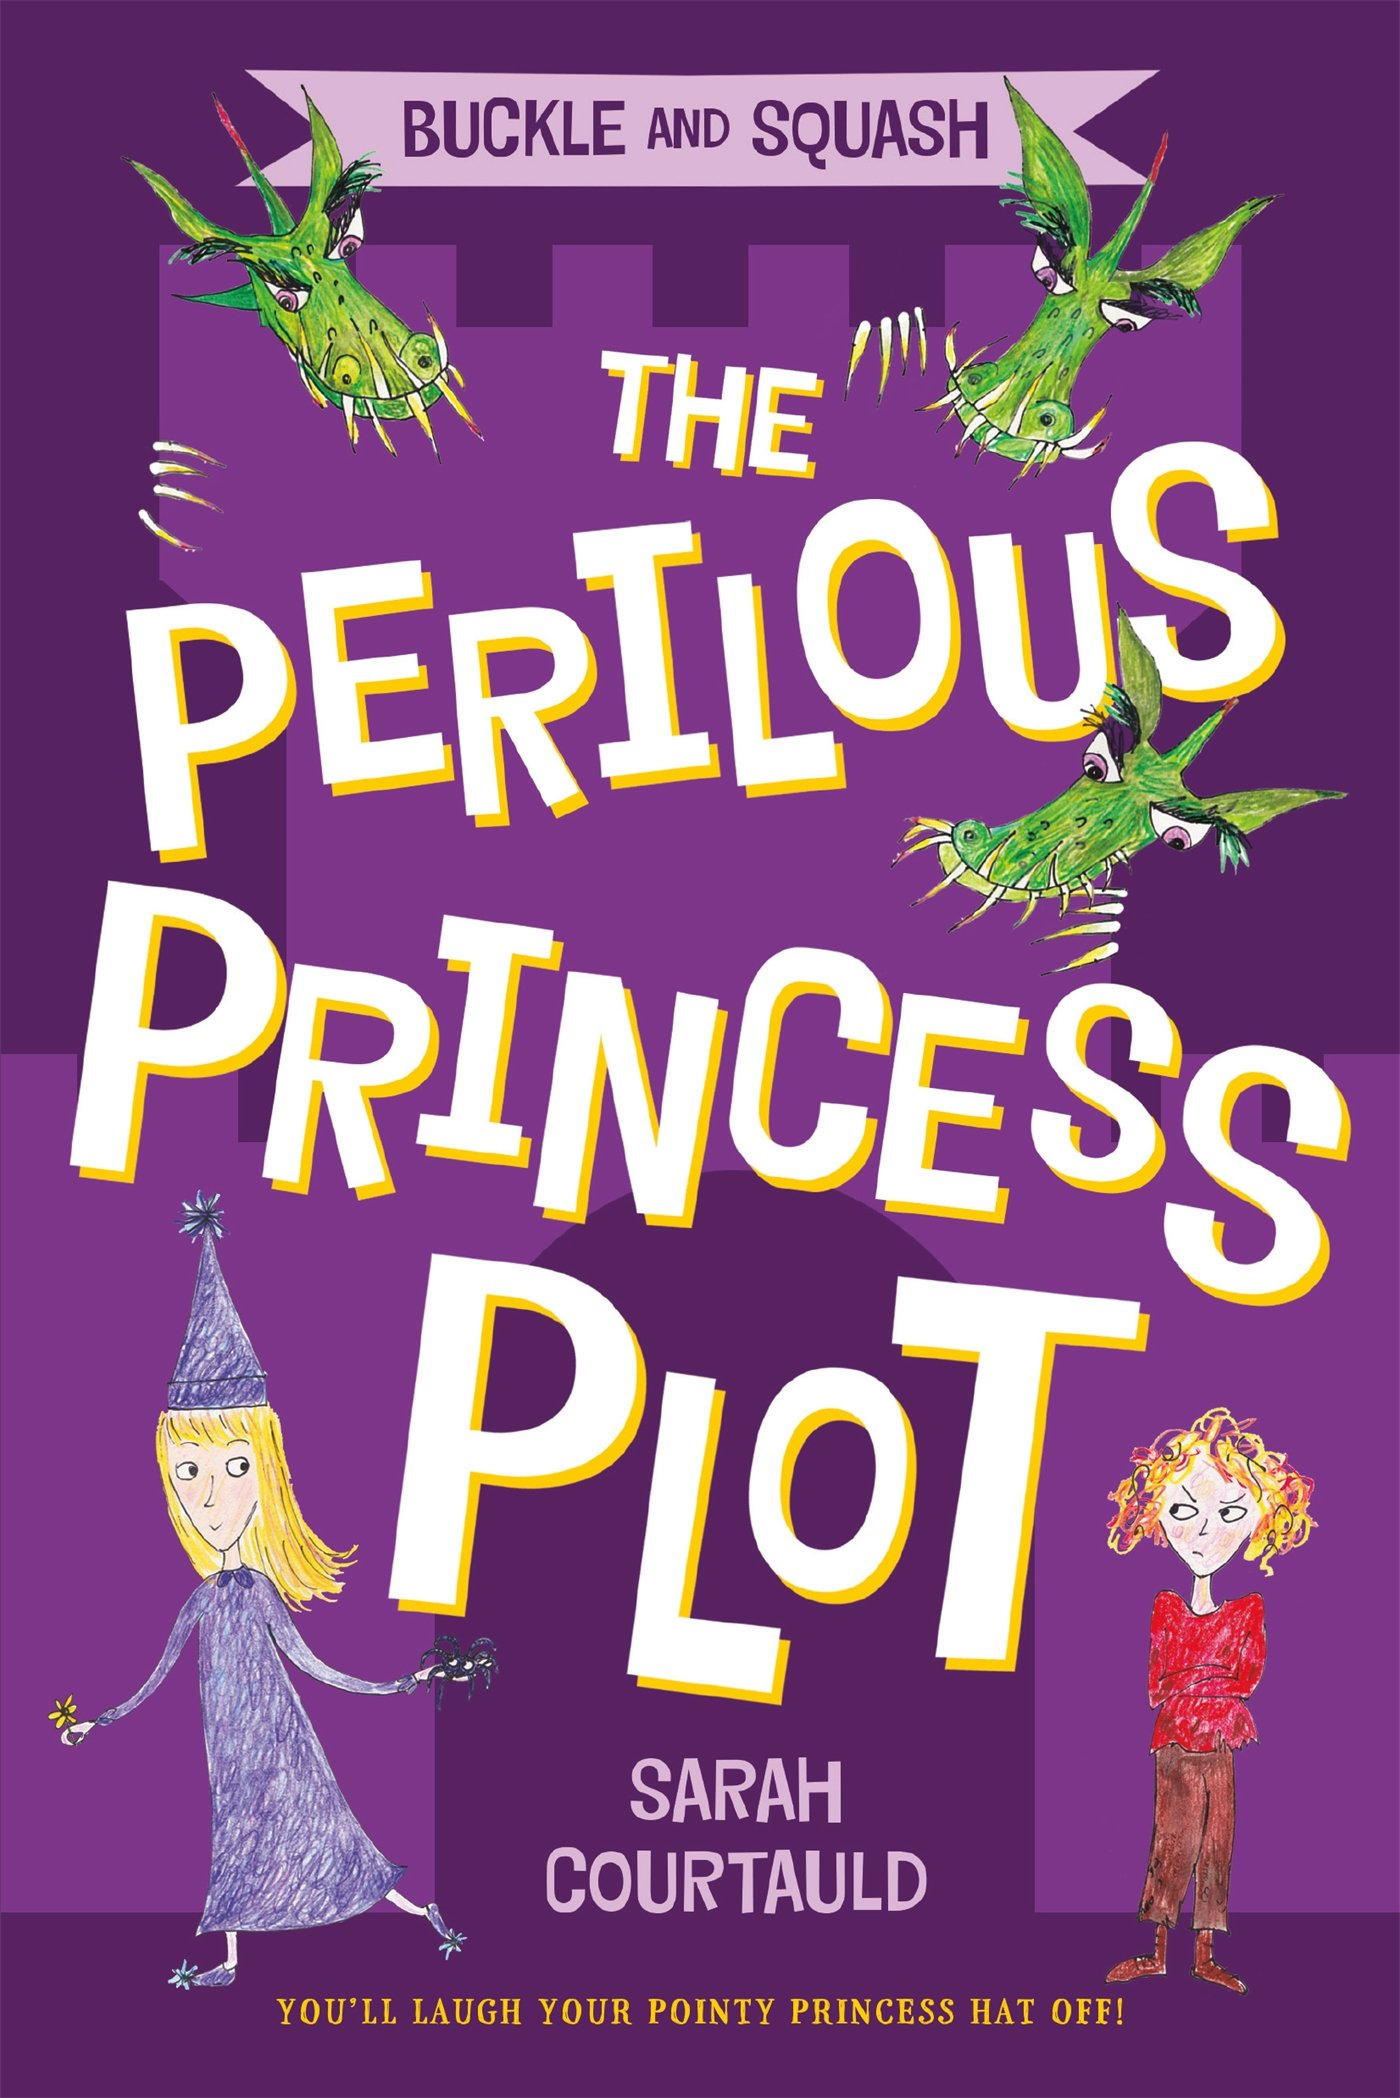 Buckle And Squash The Perilous Princess Plot Sarah Courtauld